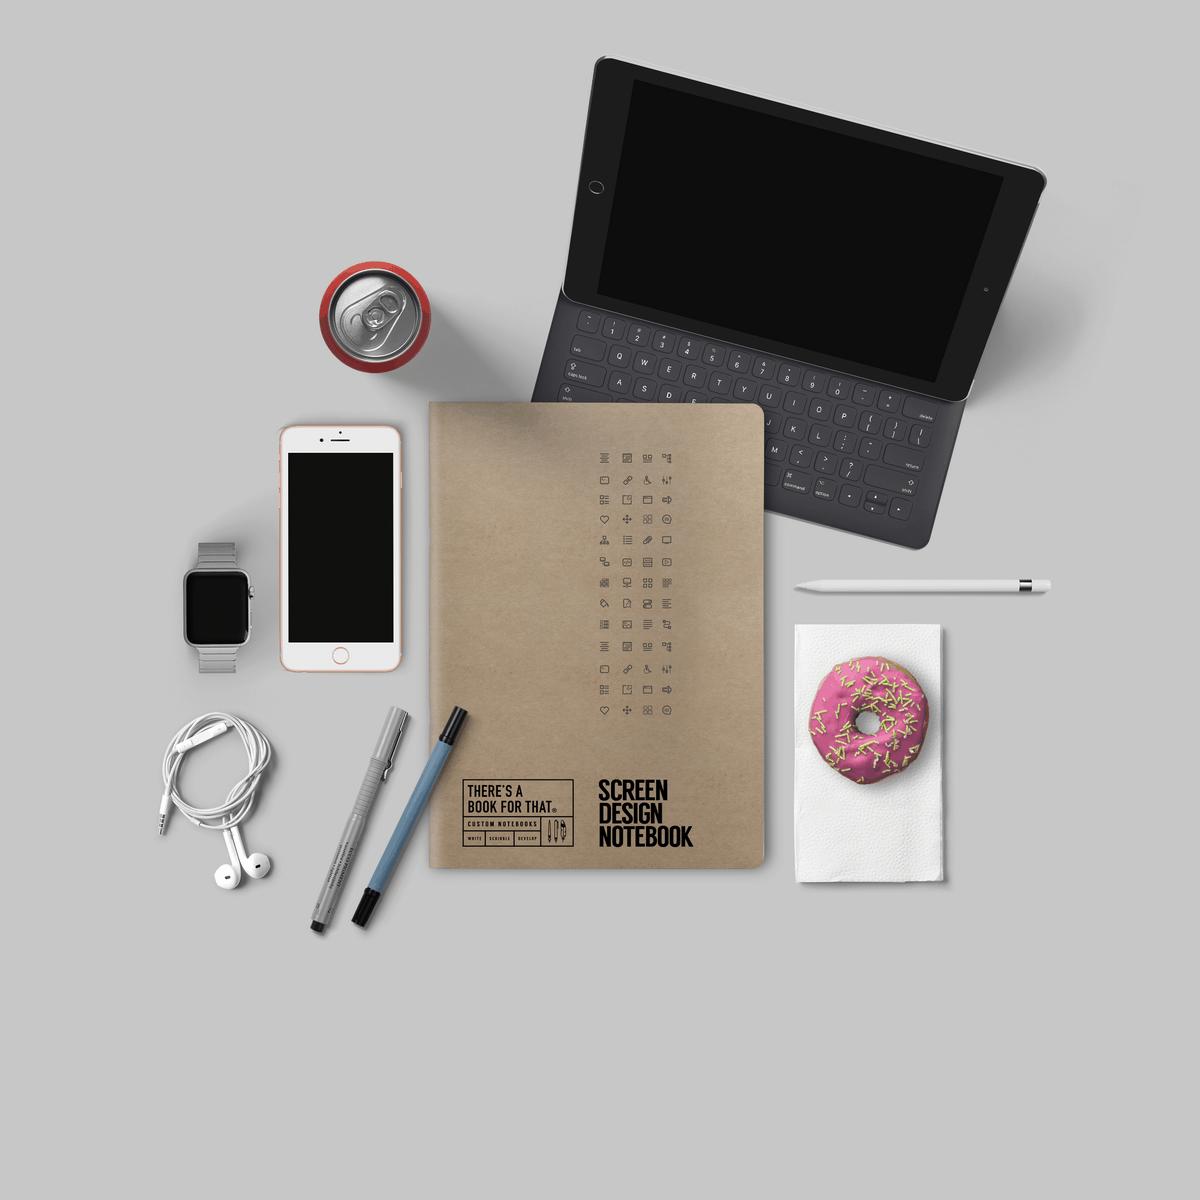 c A Book For That - Screendesign Notizbuch - Smartes Notizbuch